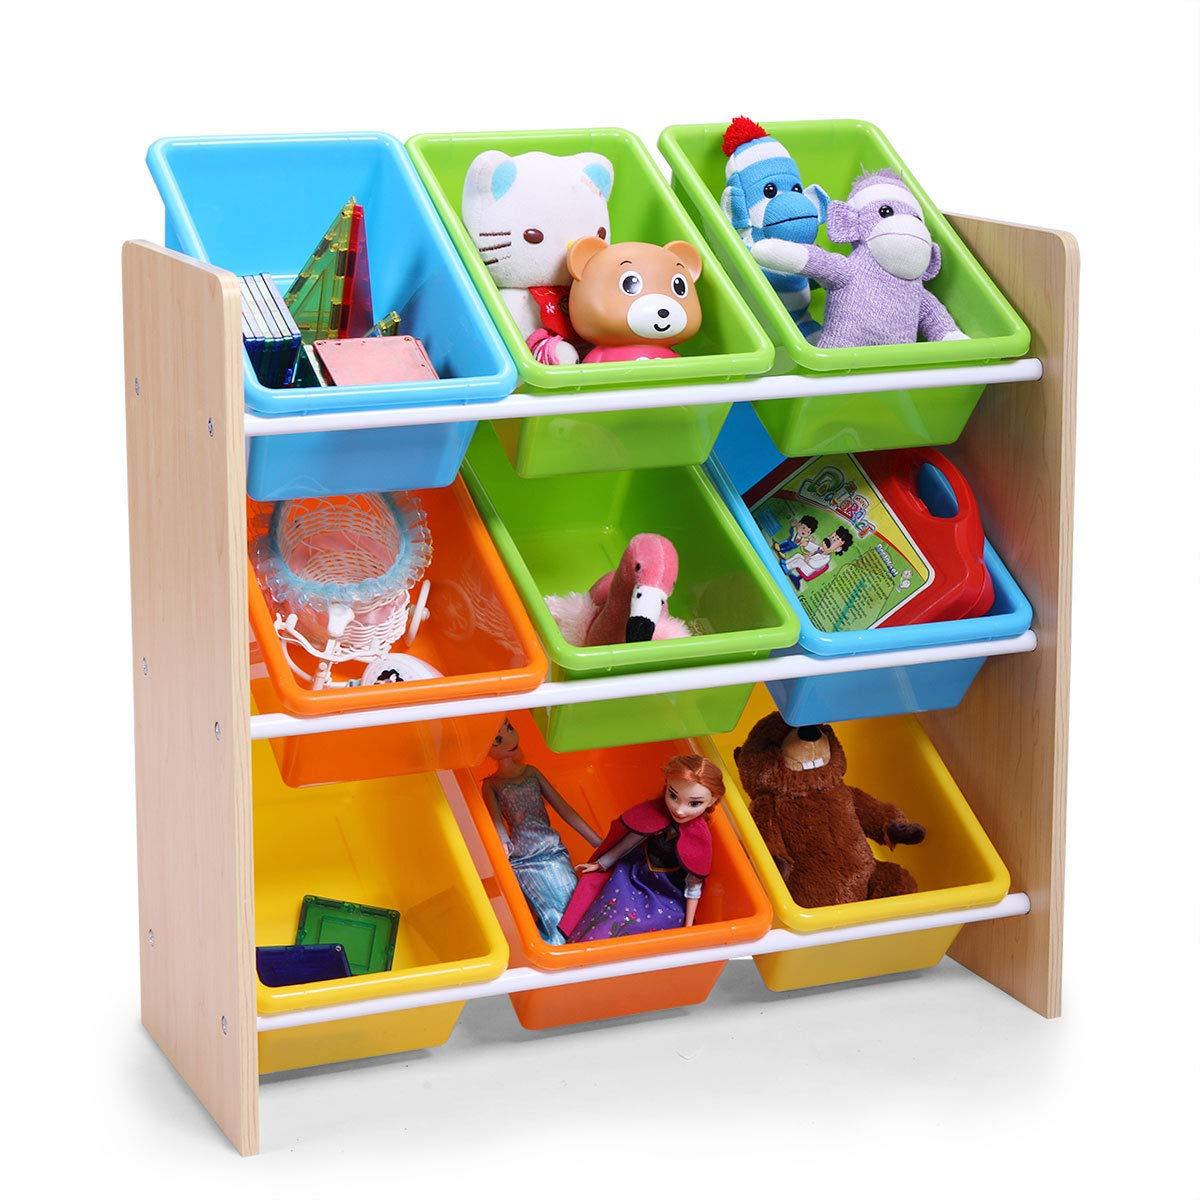 Multi-Color Toy Boxes Bins Organizer Kids Storage Playroom Bedroom Shelf